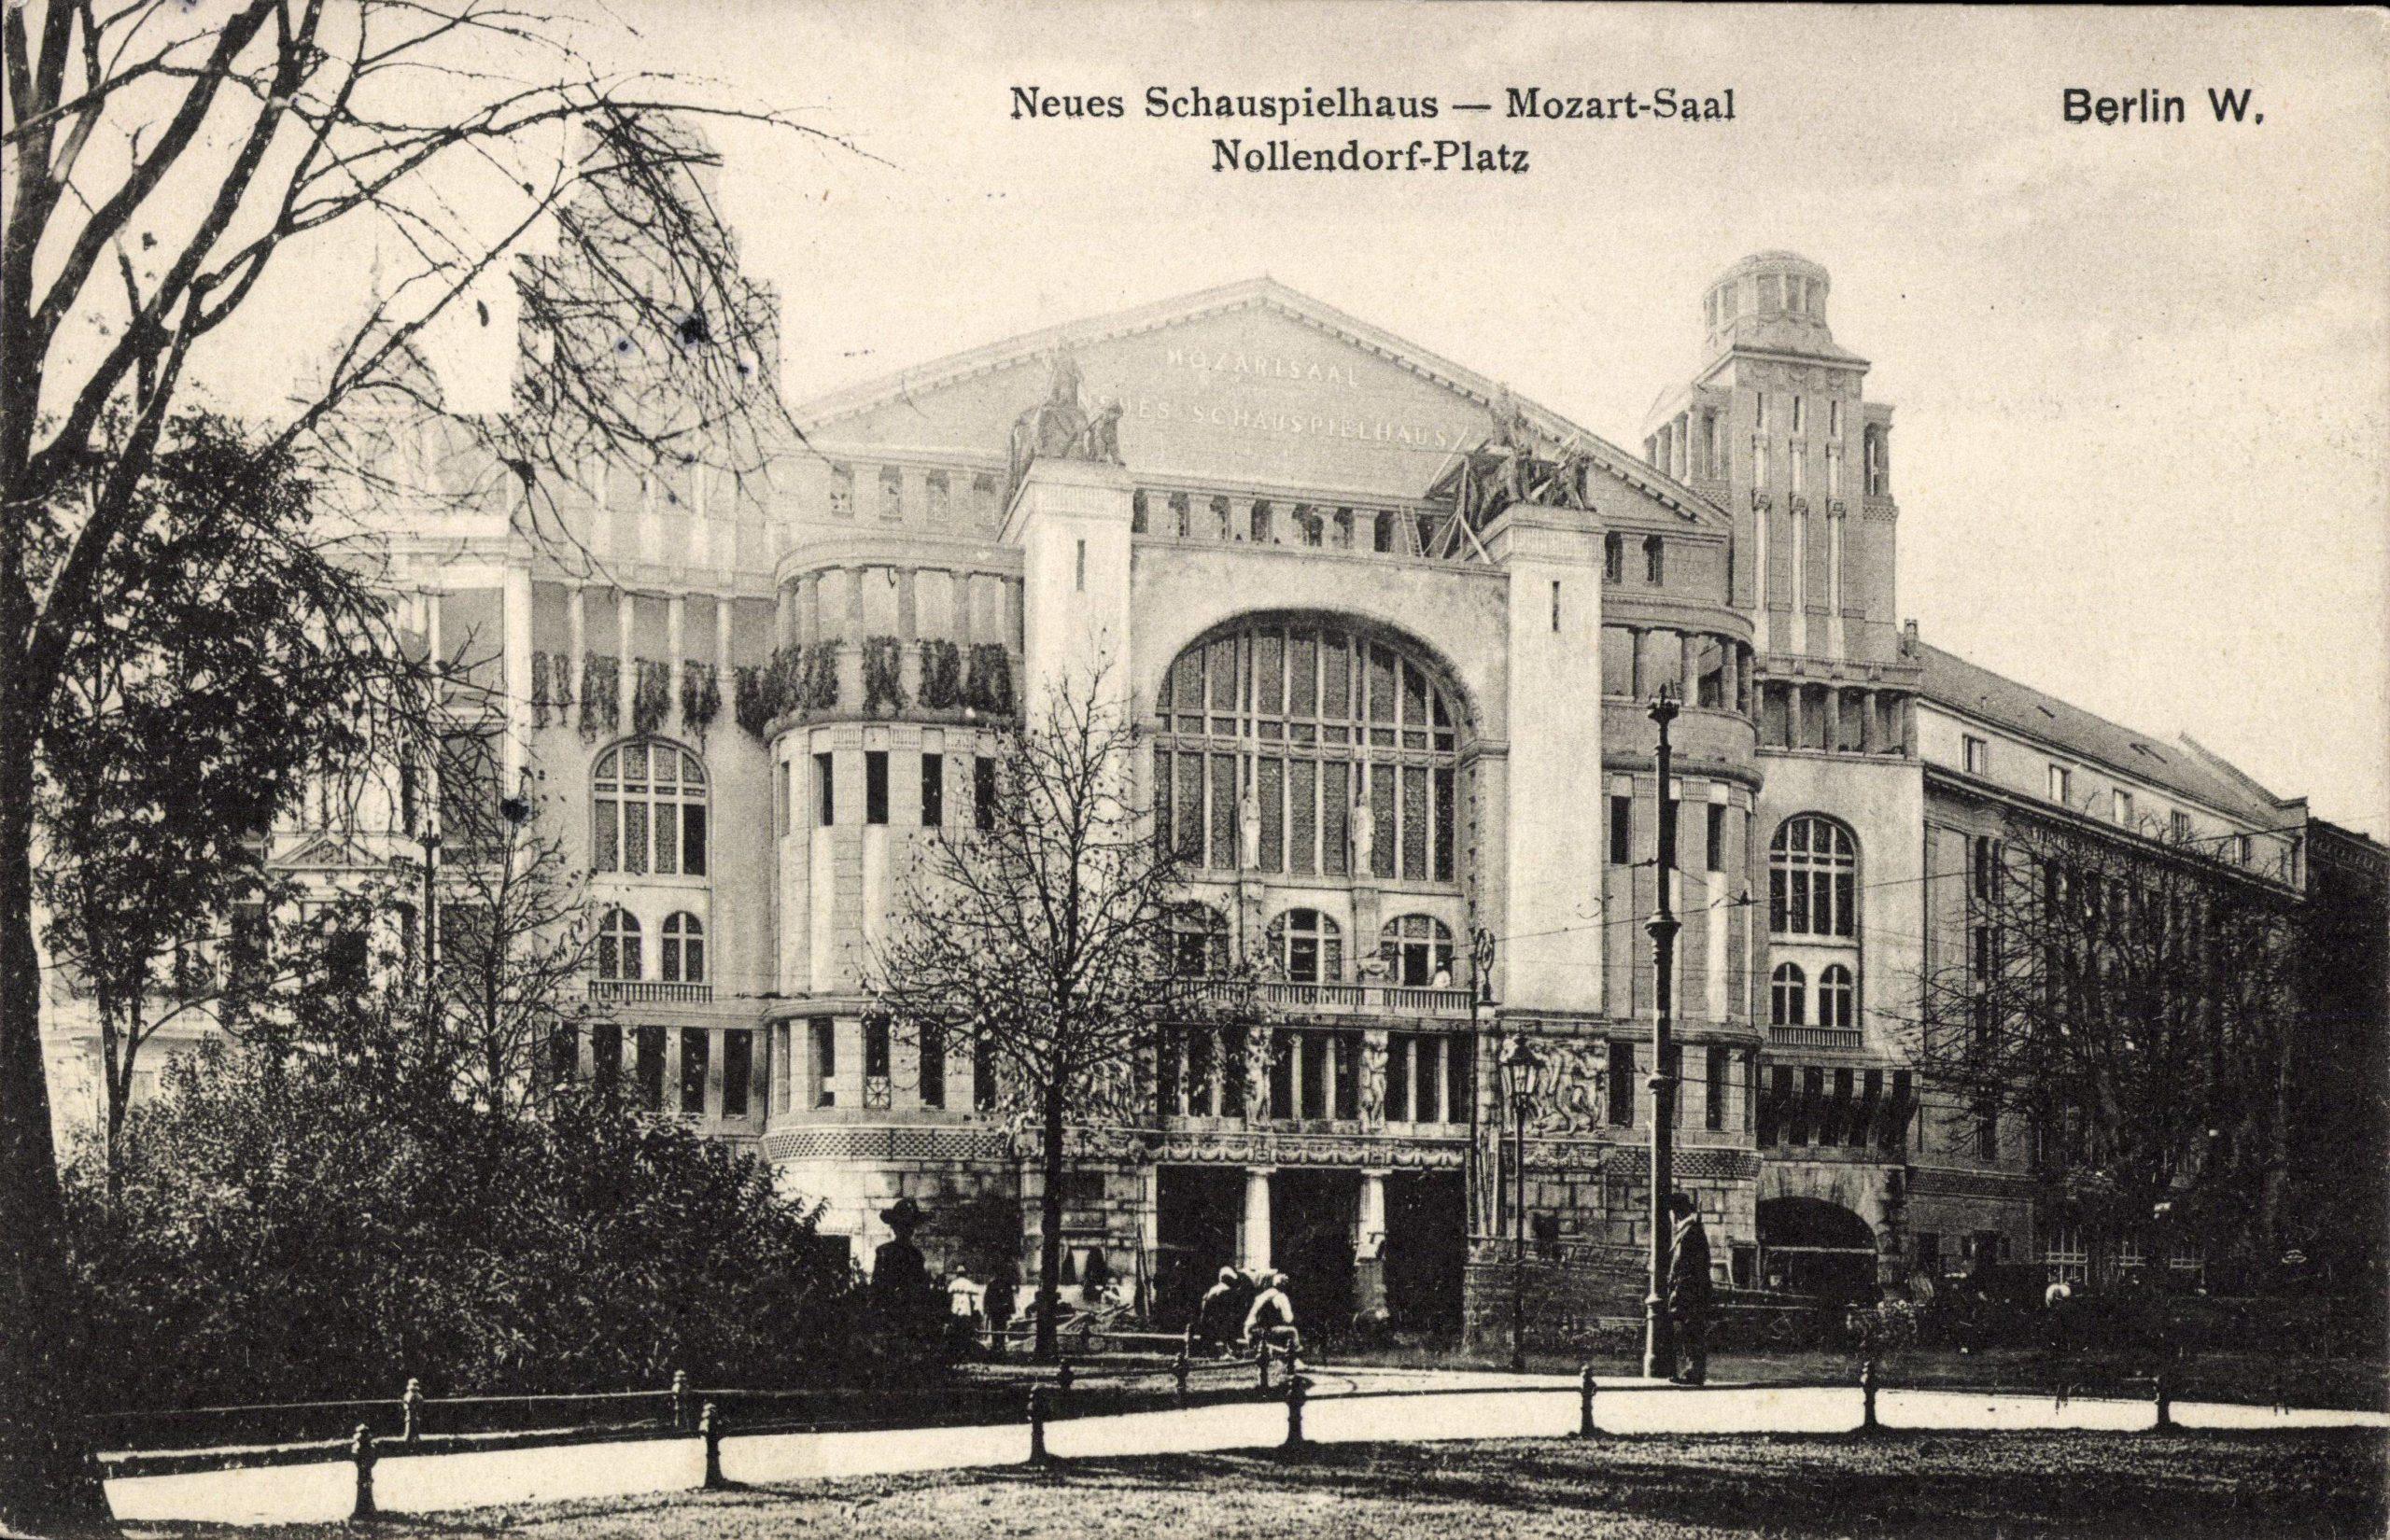 Historische Theater in Berlin: Neues Schauspielhaus am Nollendorfplatz in Schöneberg. Foto: Imago/Arkivi